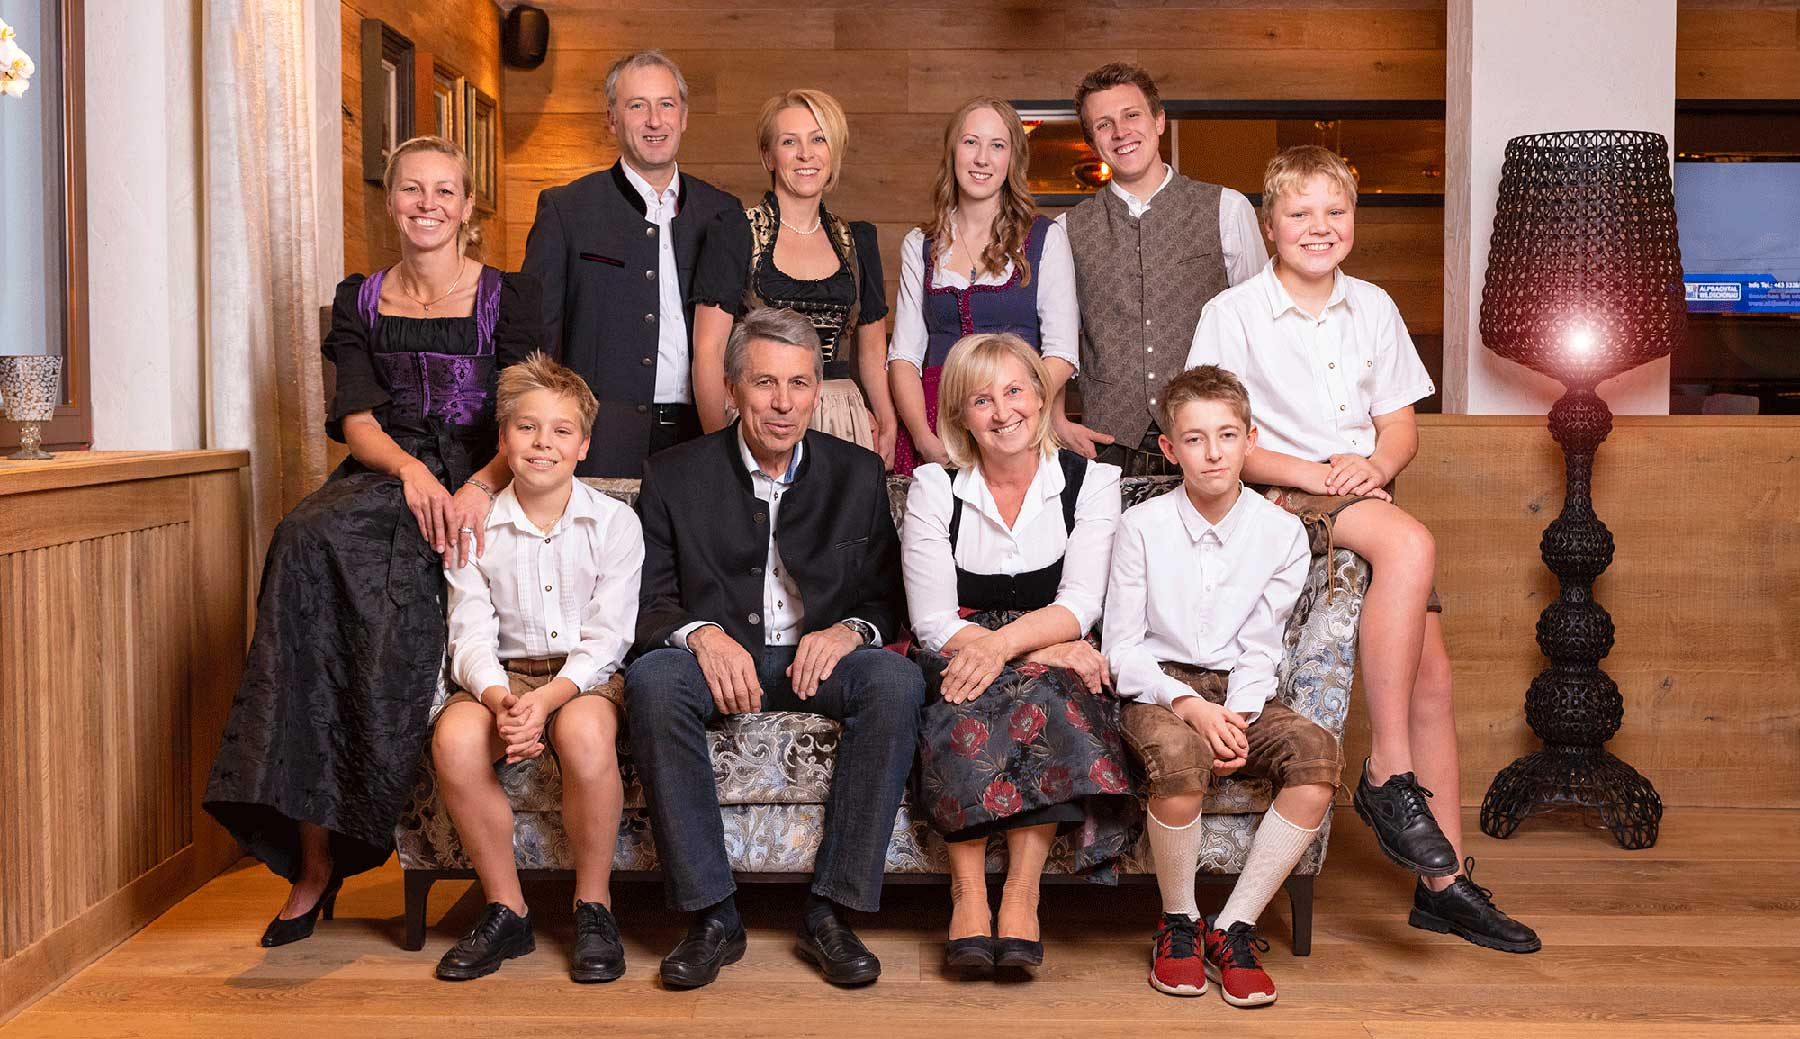 Wellnesshotel Tirol Wellnessurlaub Alpbachtal